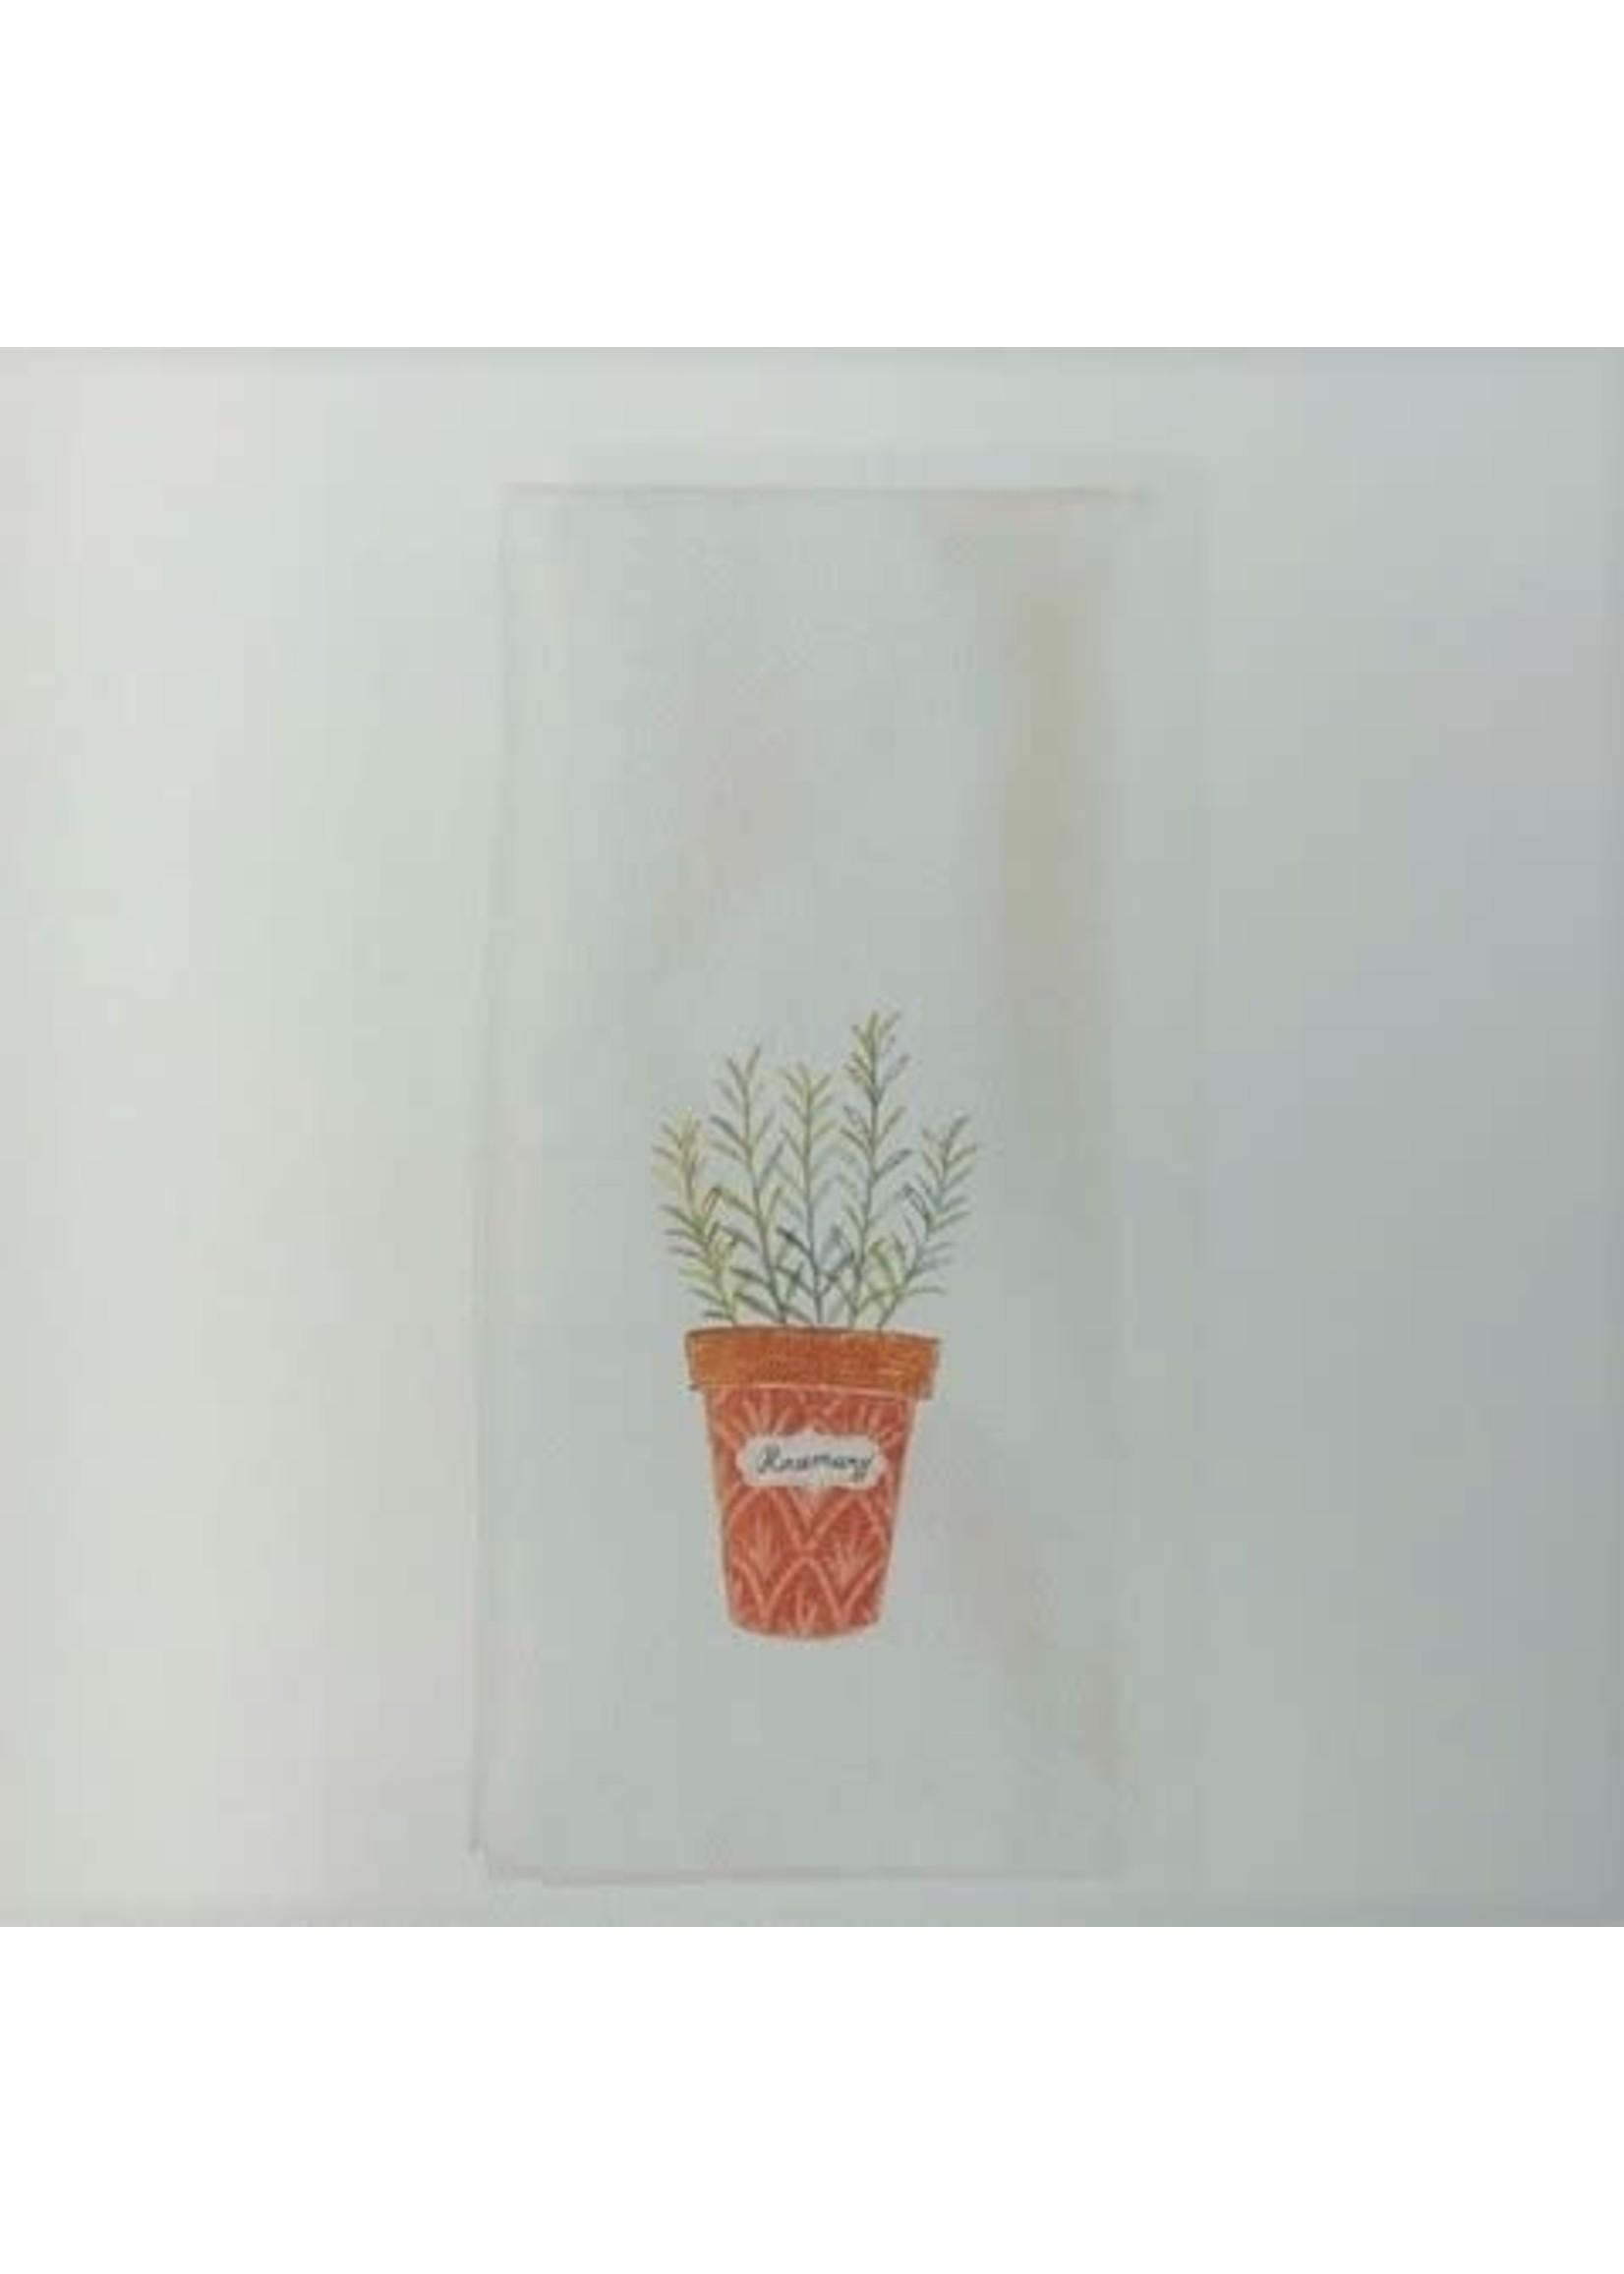 ROSEMARY HERB GARDEN DISH TOWEL